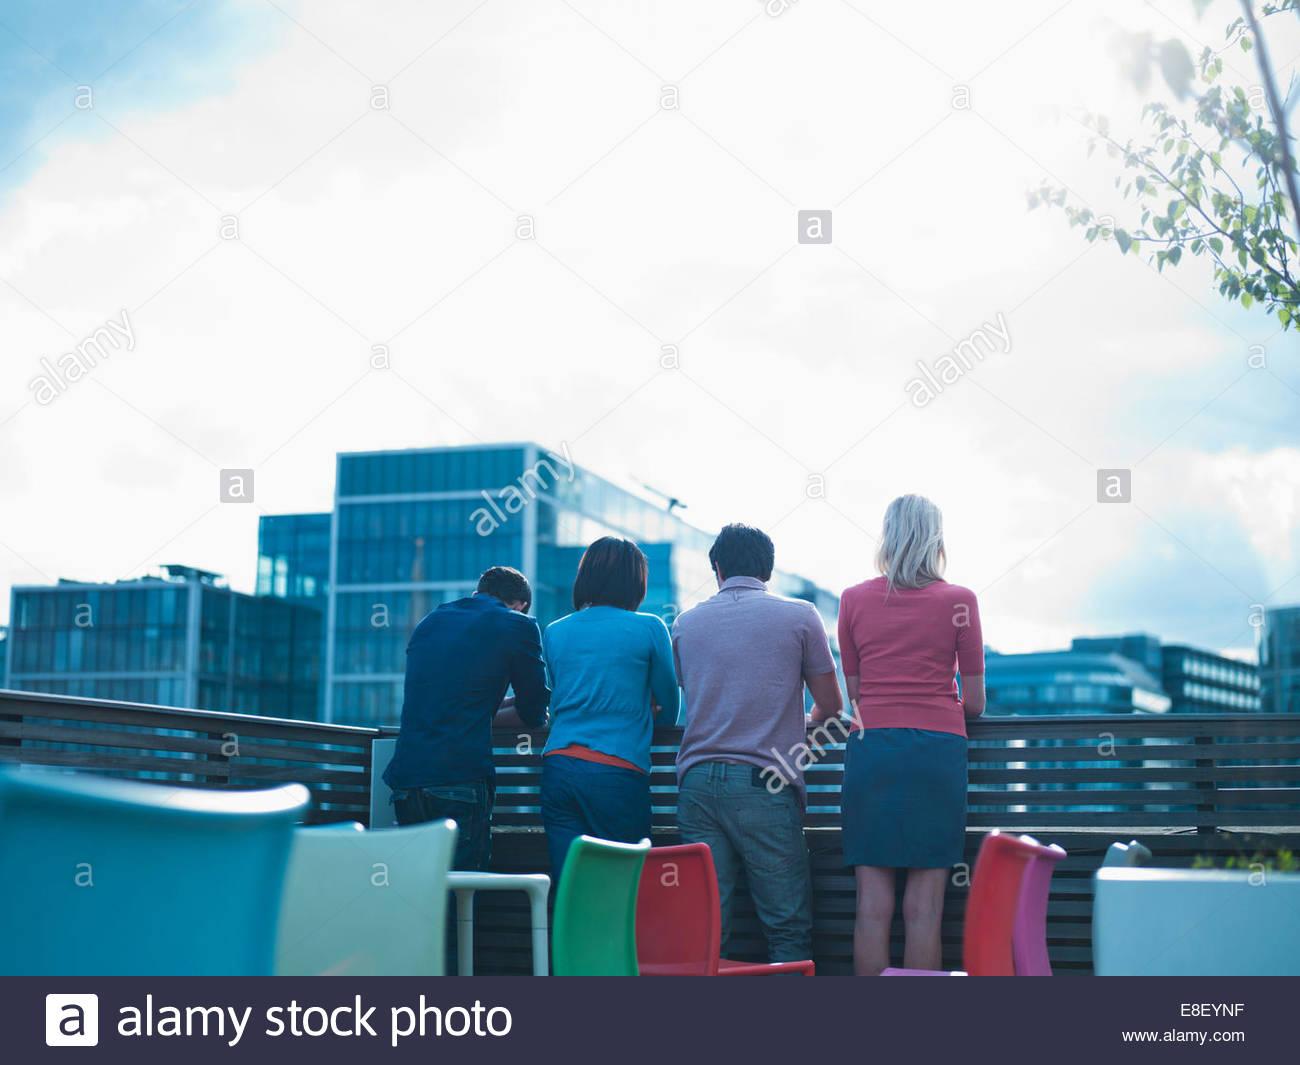 Smiling men and women talking on urban balcony - Stock Image